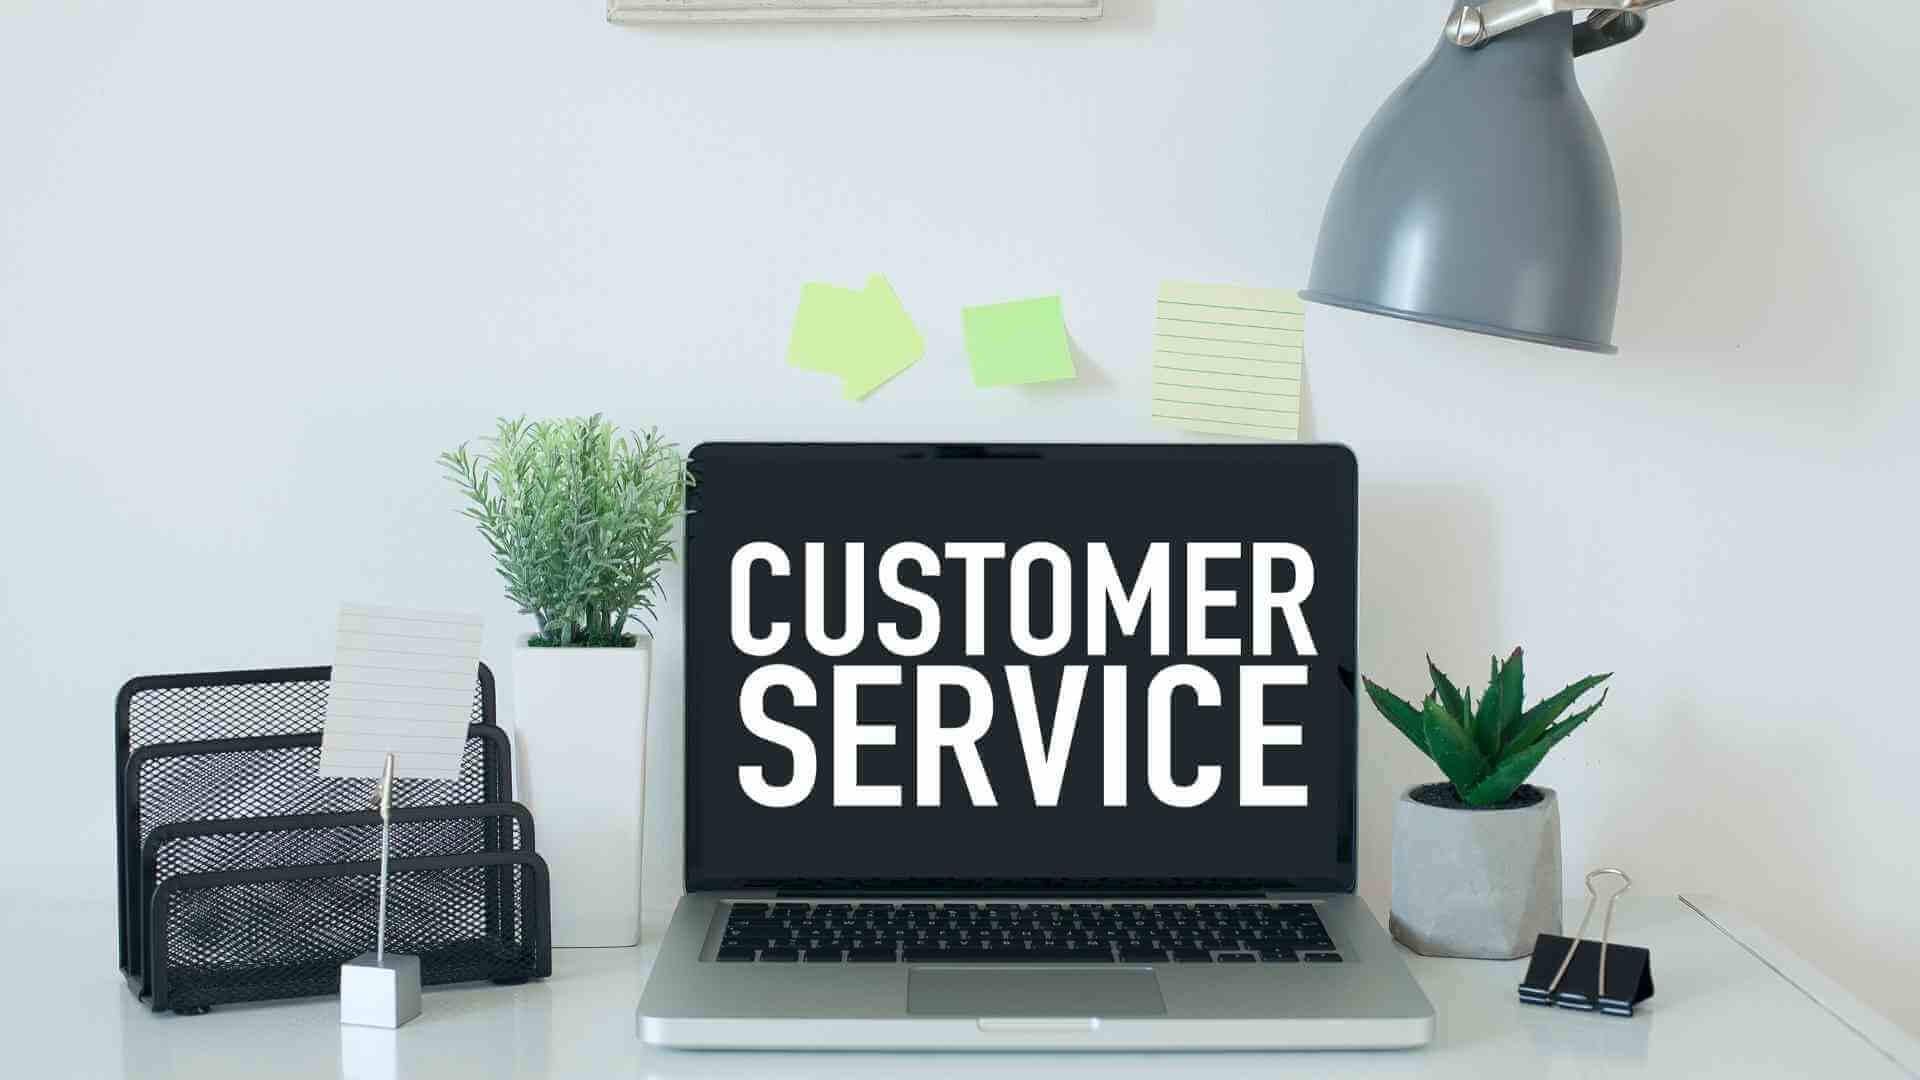 2020 Web Design Trends - Customer Service is not dead